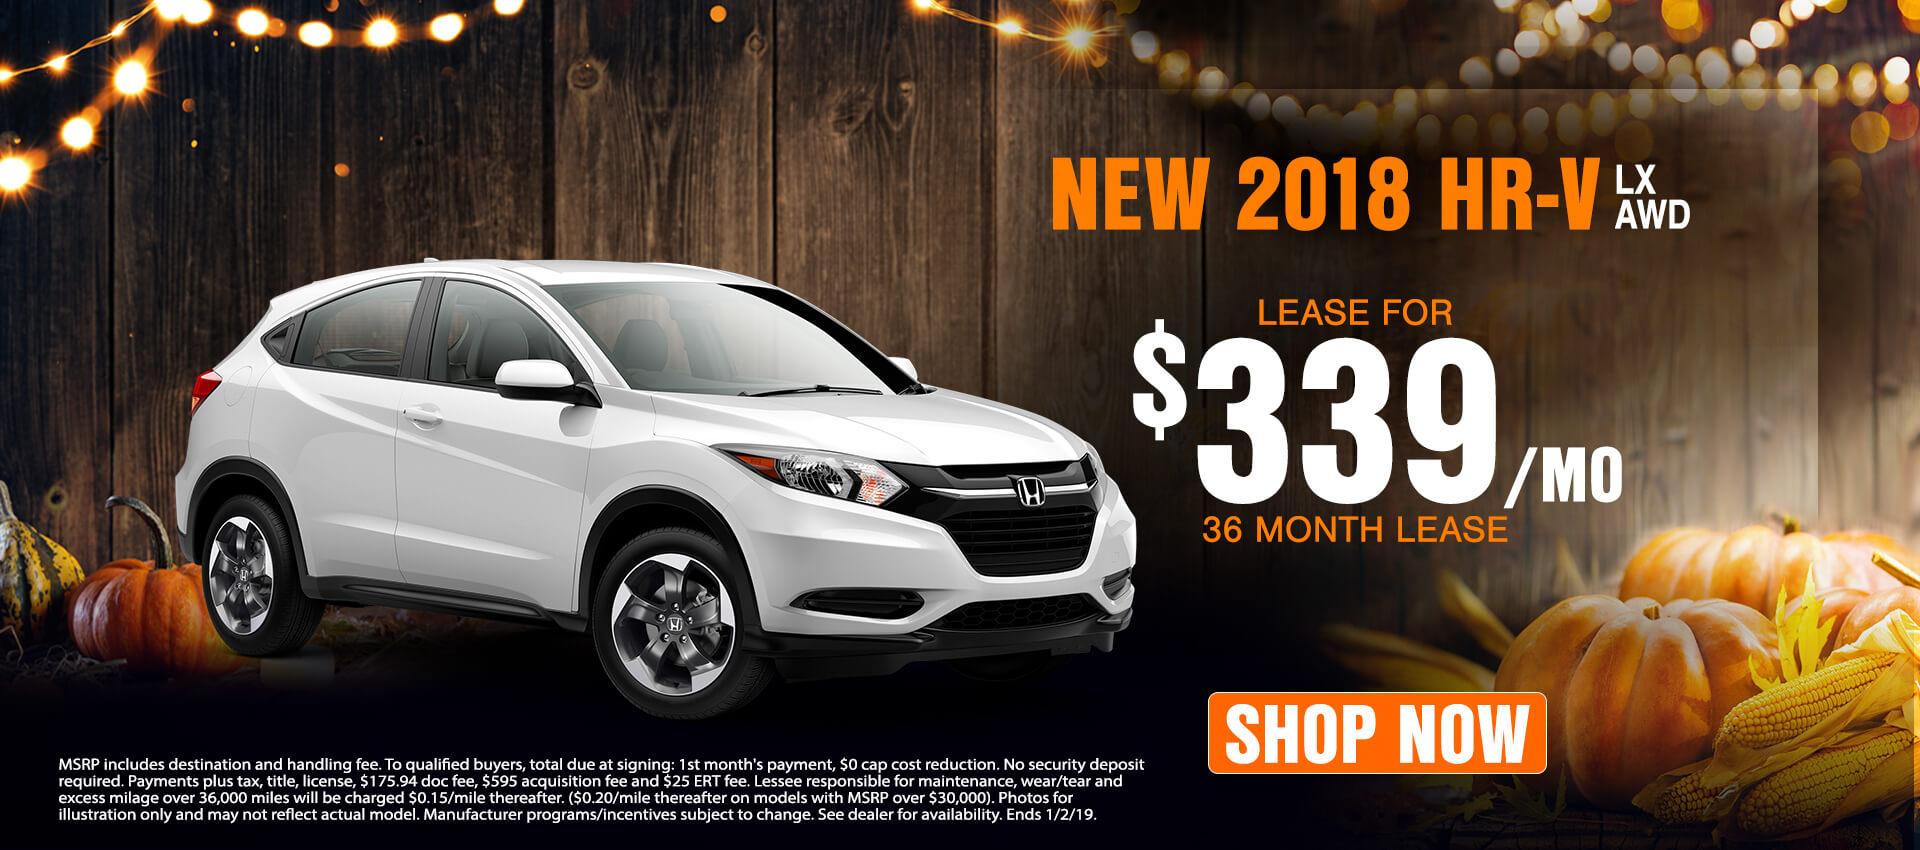 2018 HR-V $339 Lease